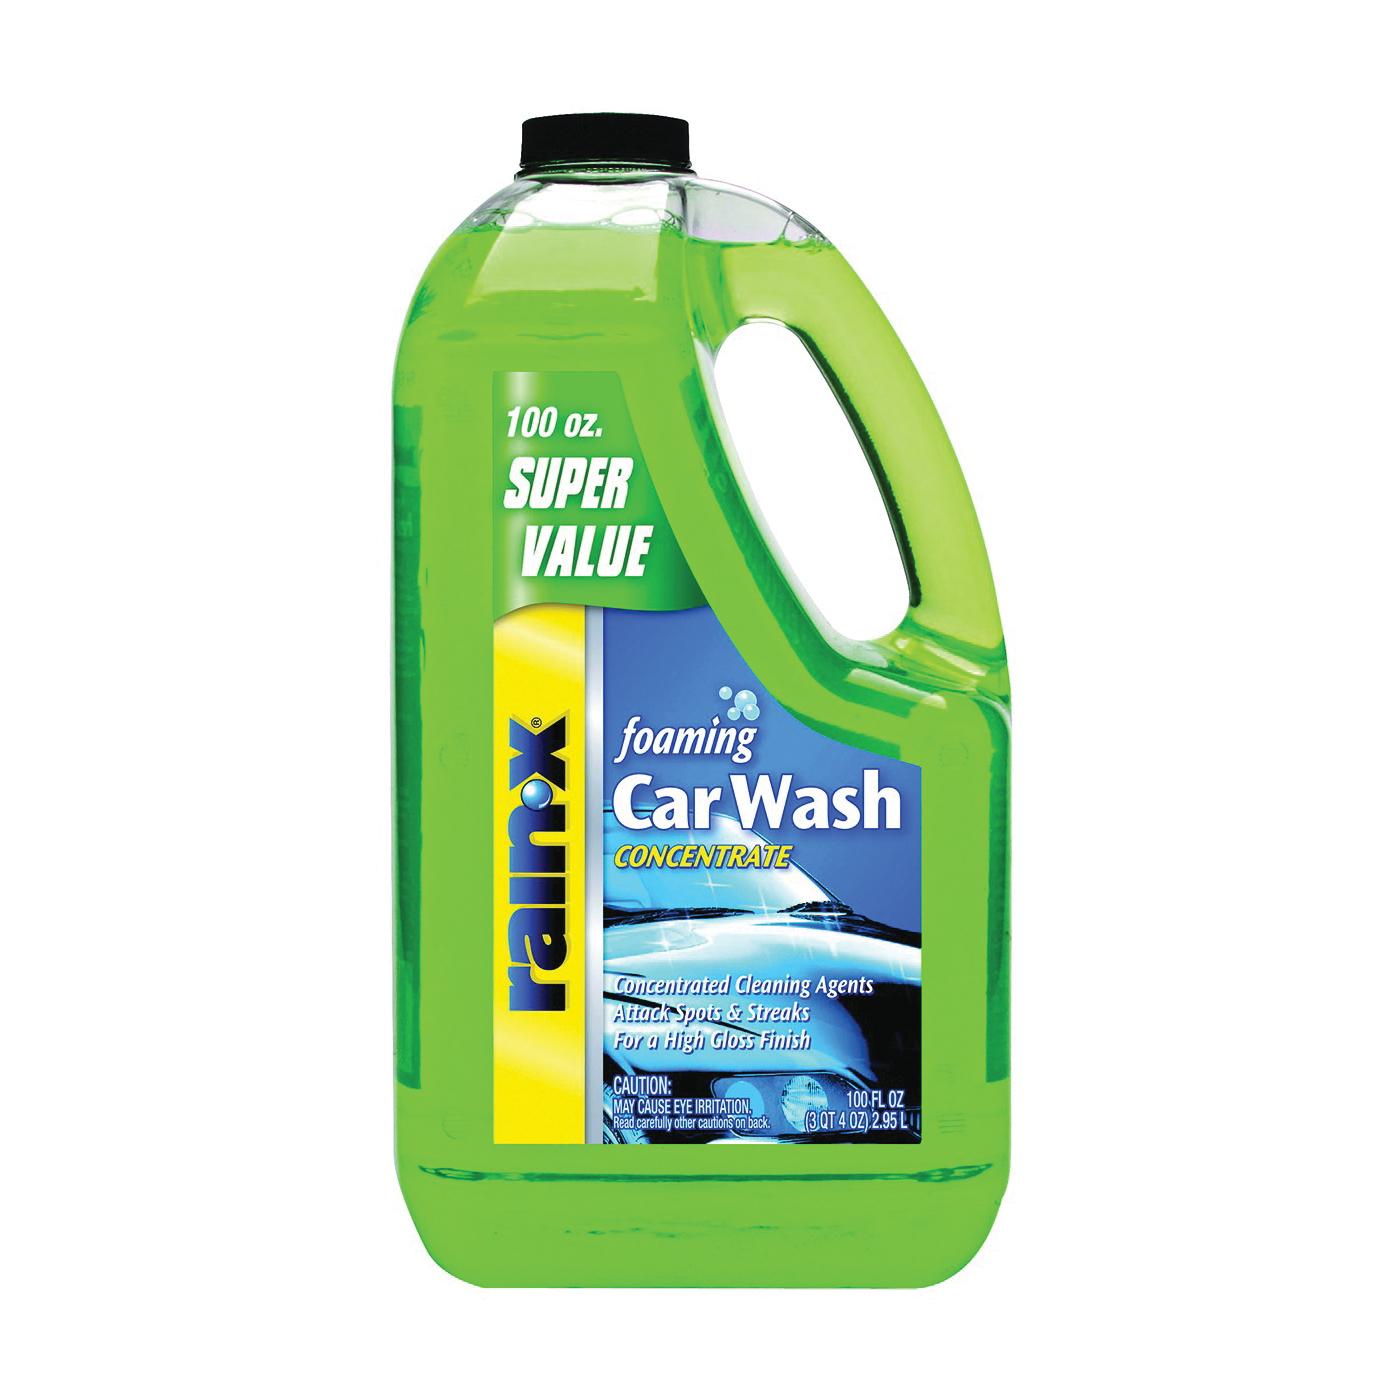 Picture of Rain-X 5072084 Car Wash, 100 oz Package, Liquid, Mild